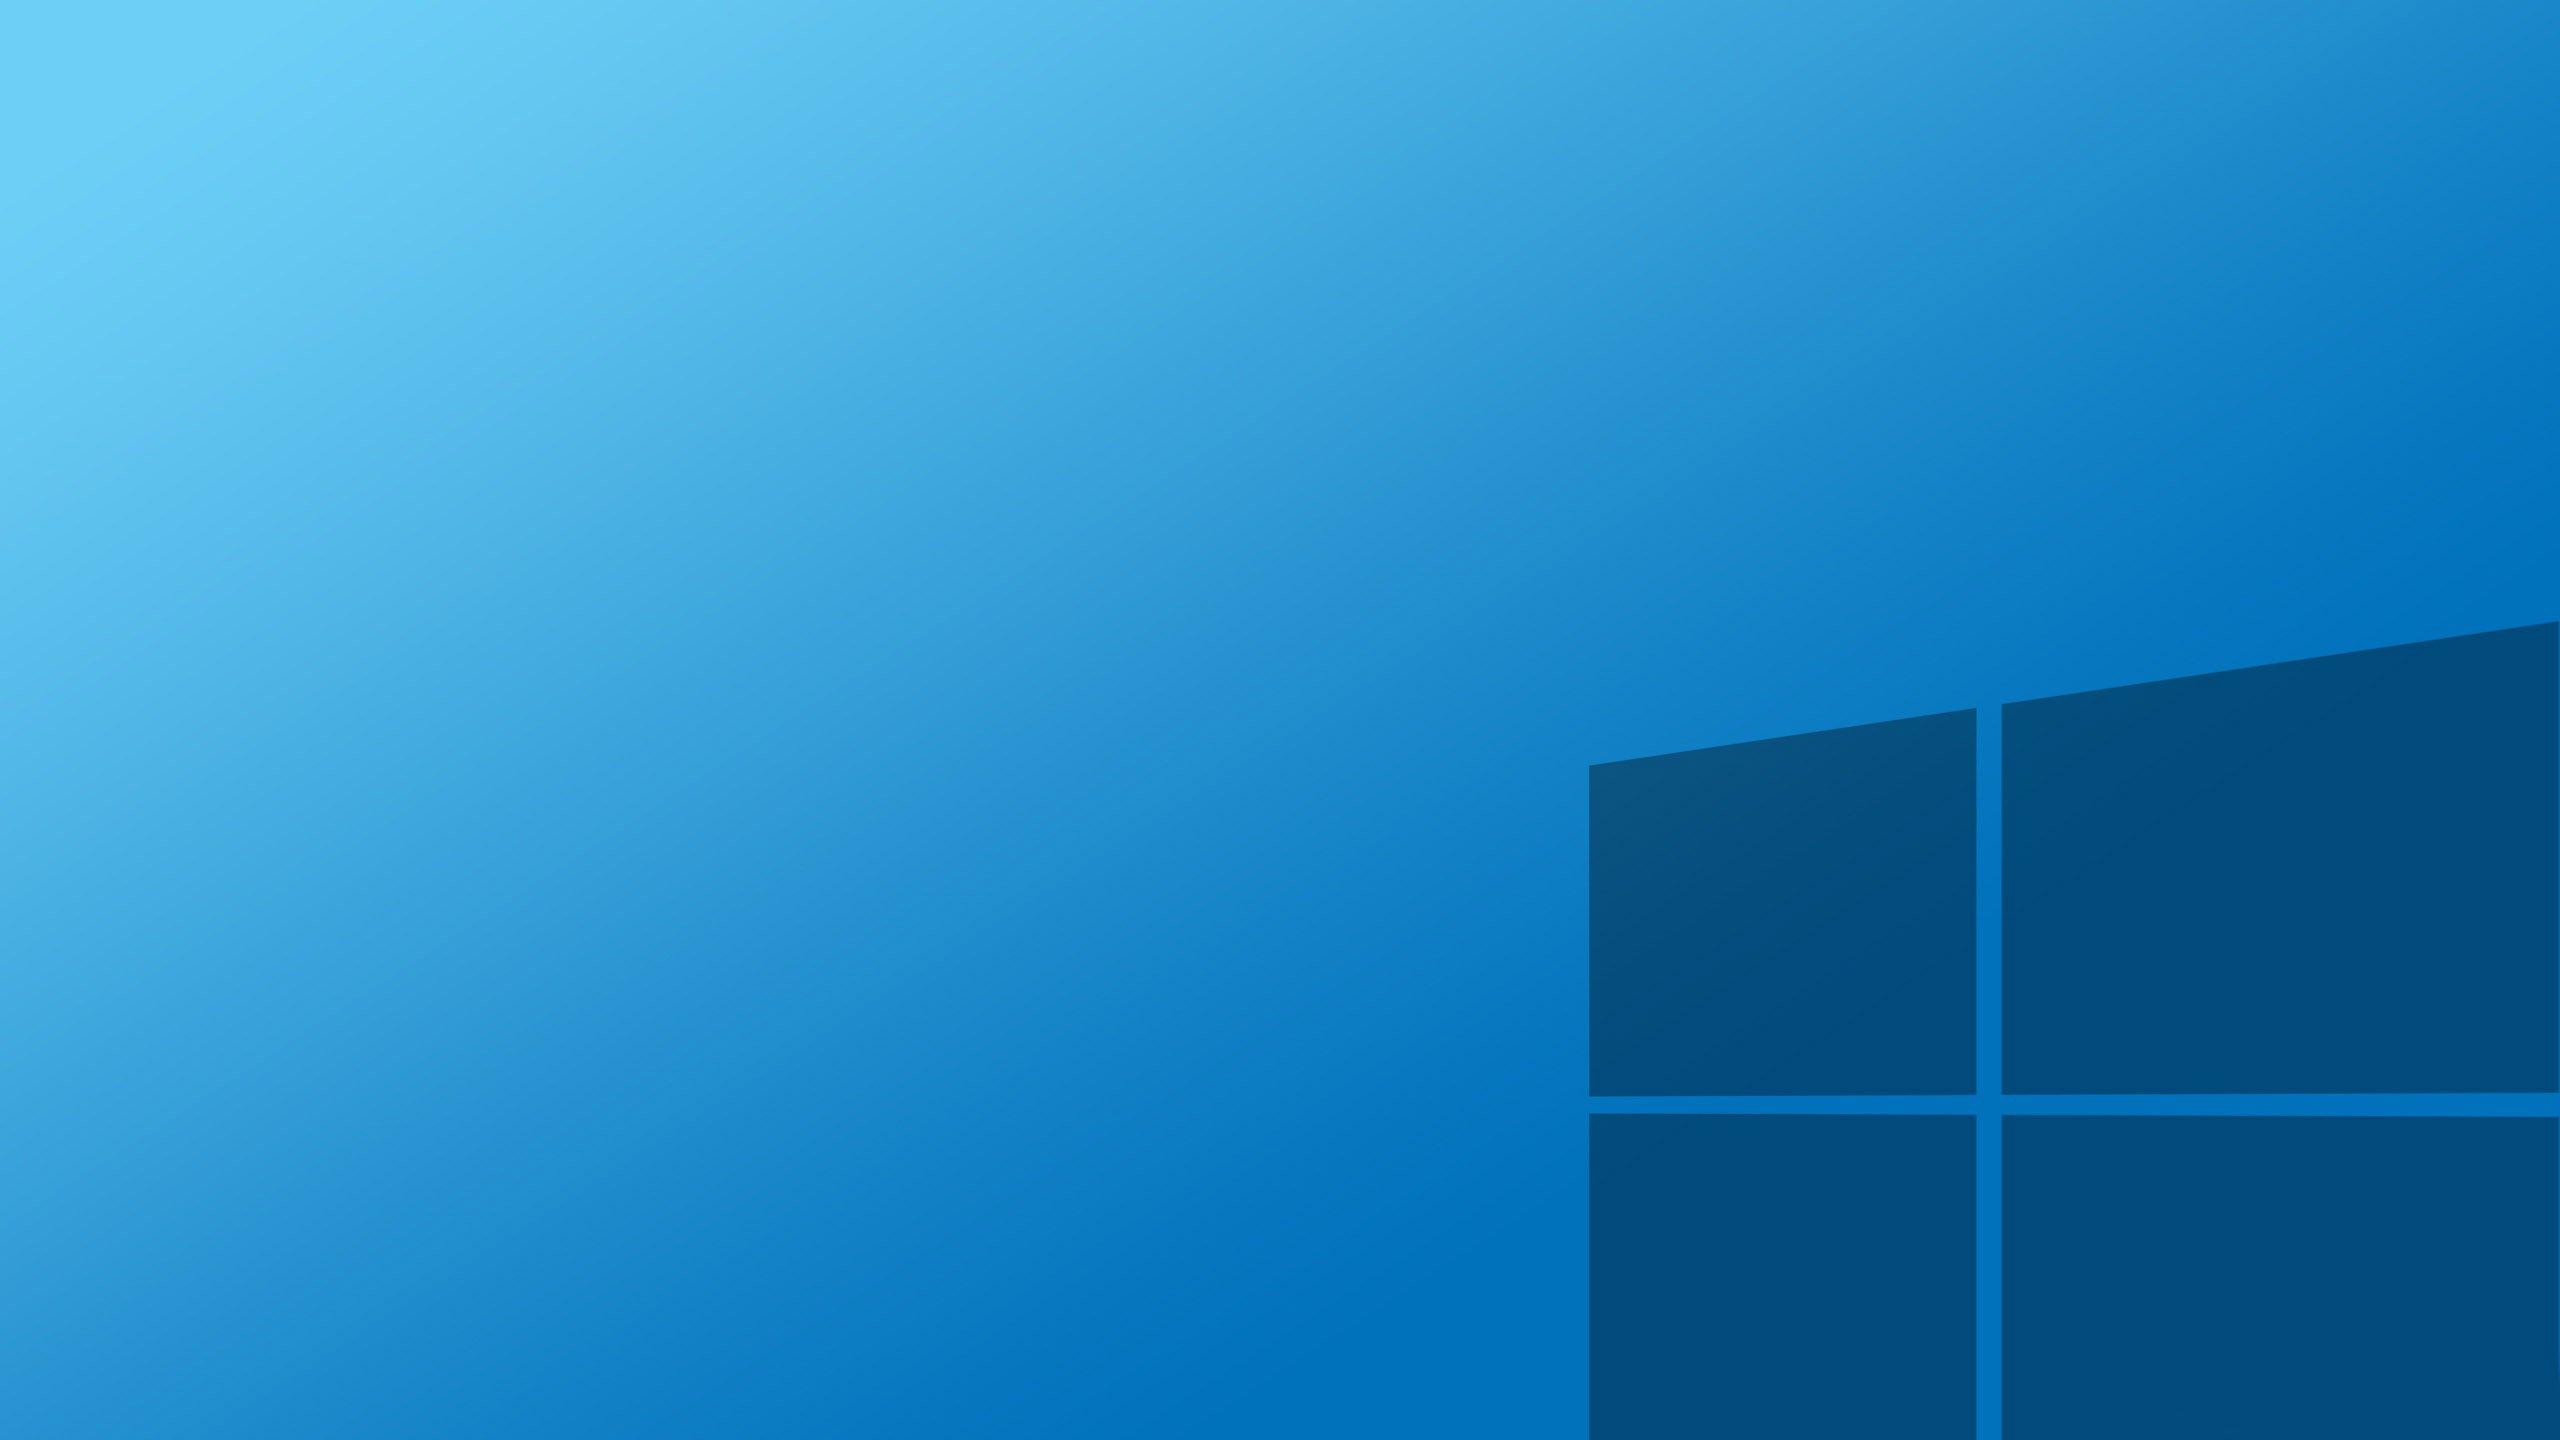 Customizing the Windows 10 Start Menu